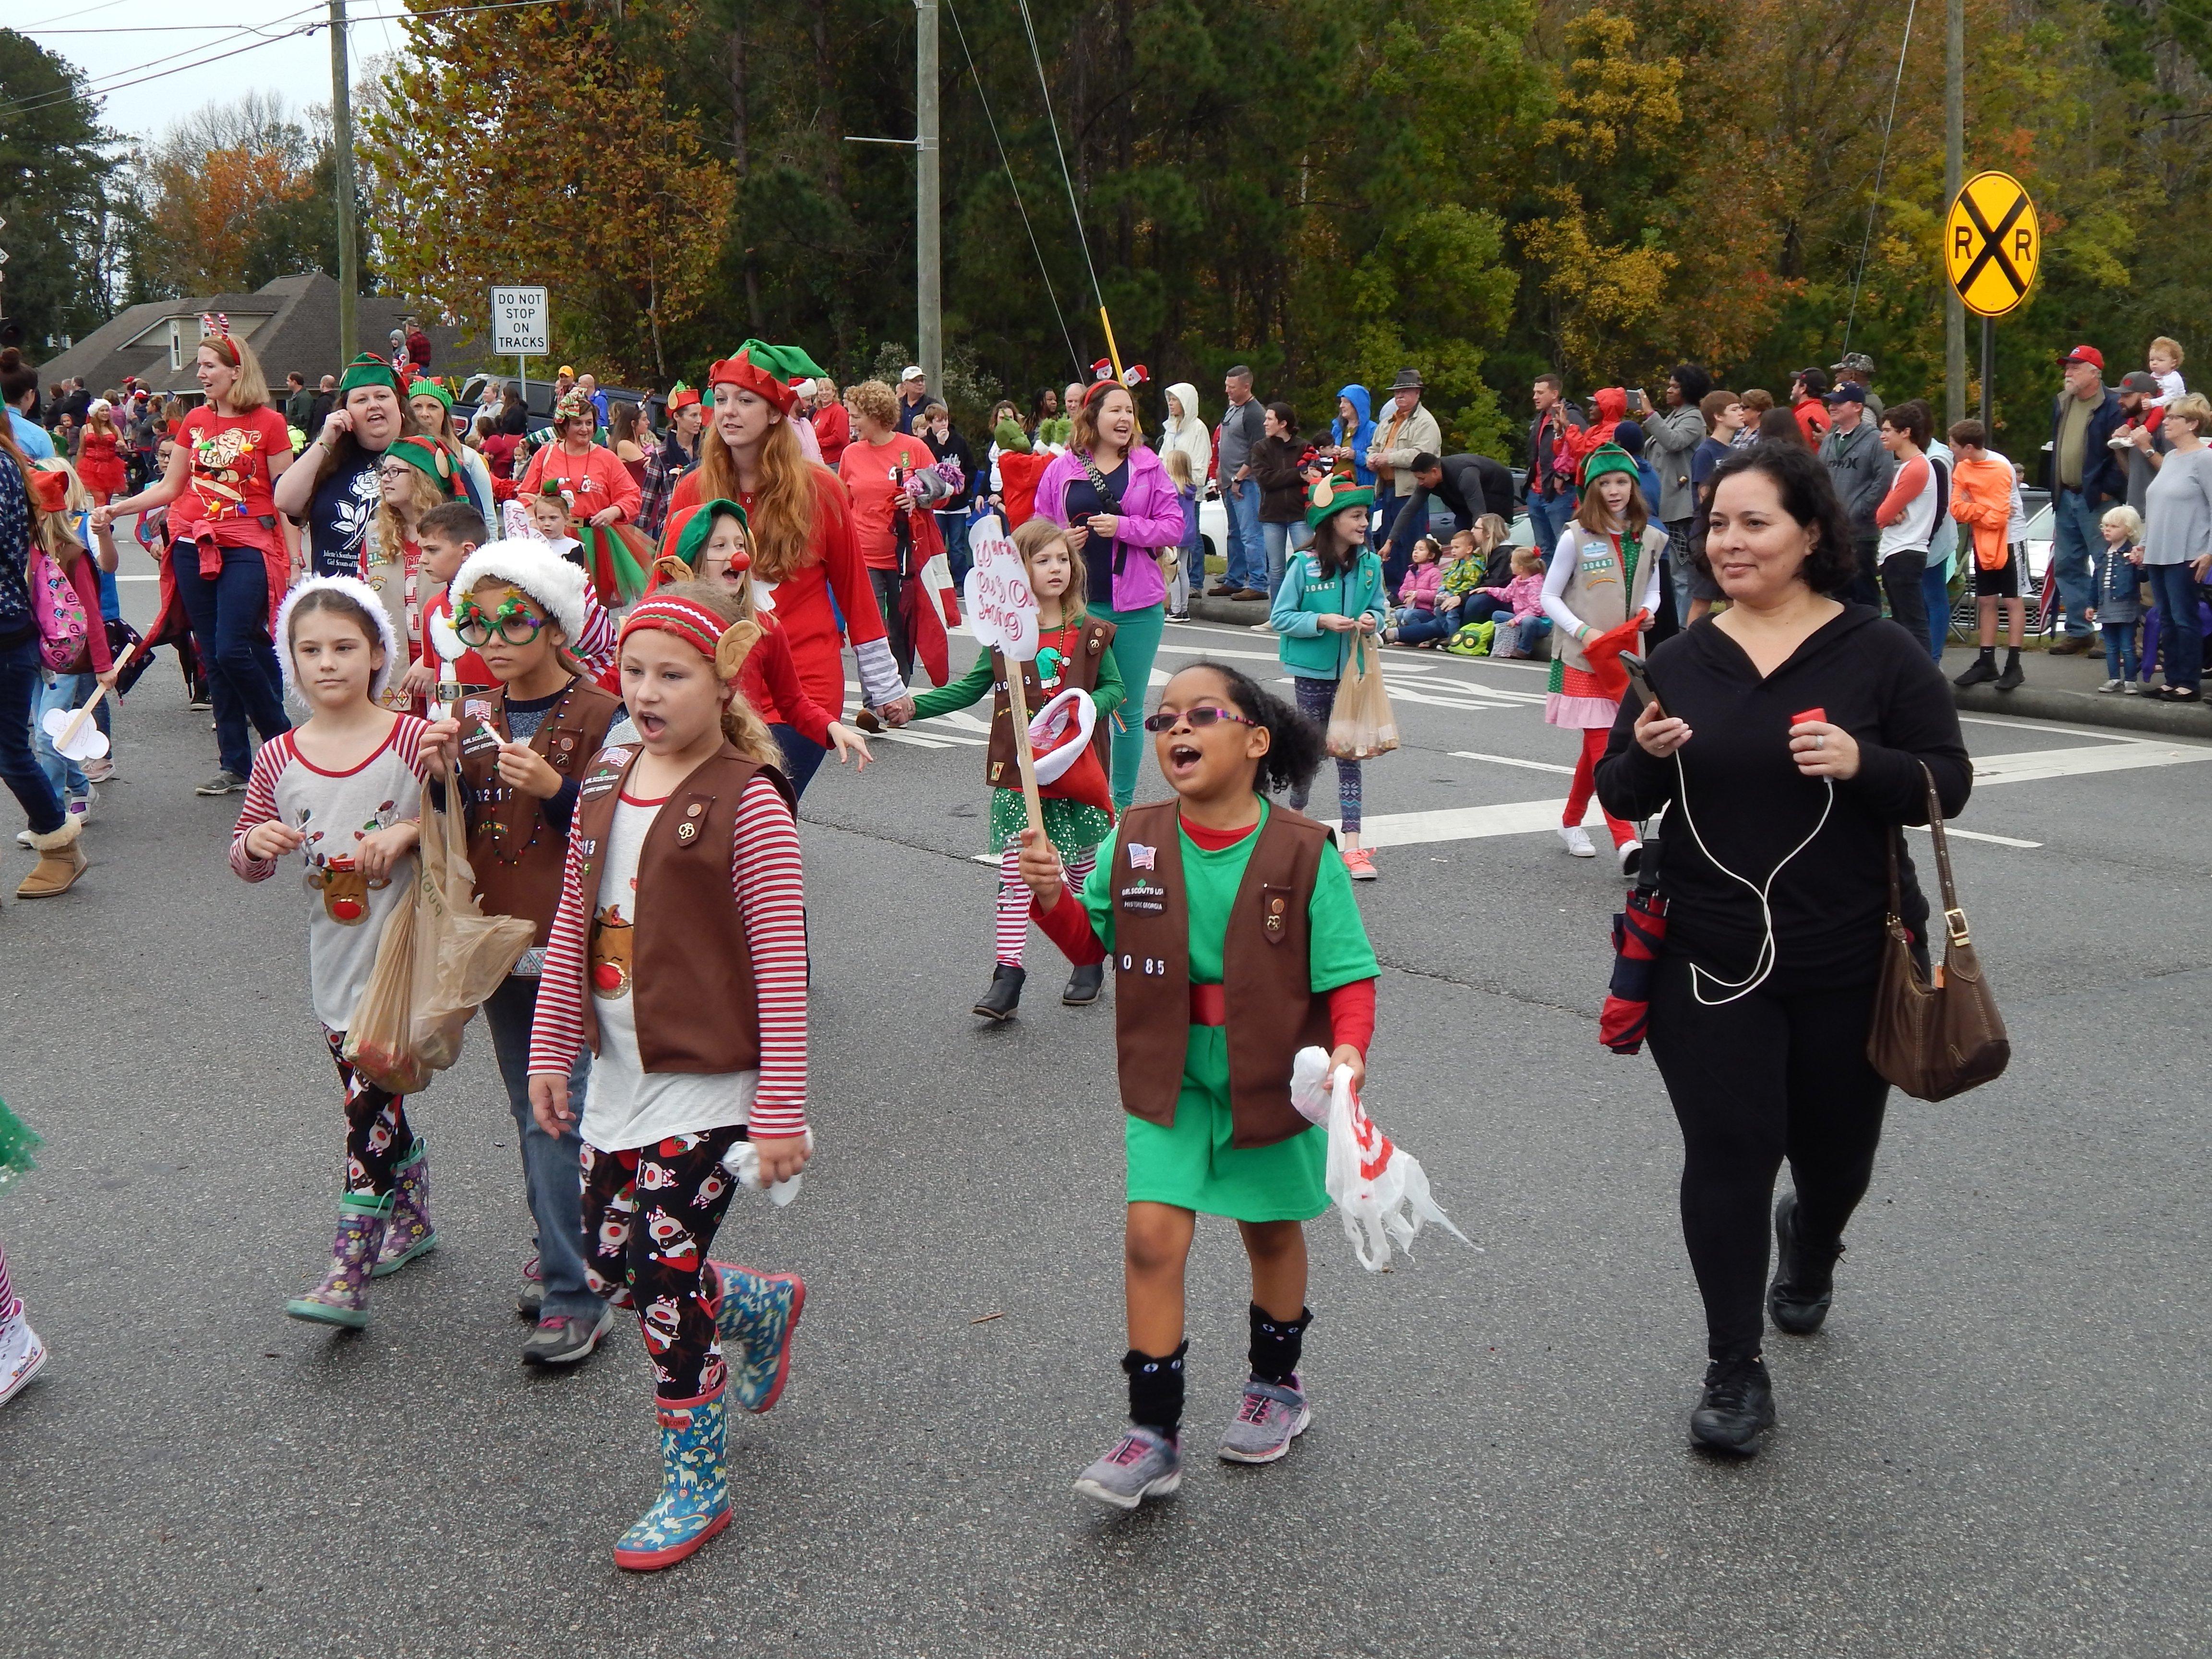 2018 Richmond Hill Christmas Parade. Photo by Mark Swendra.